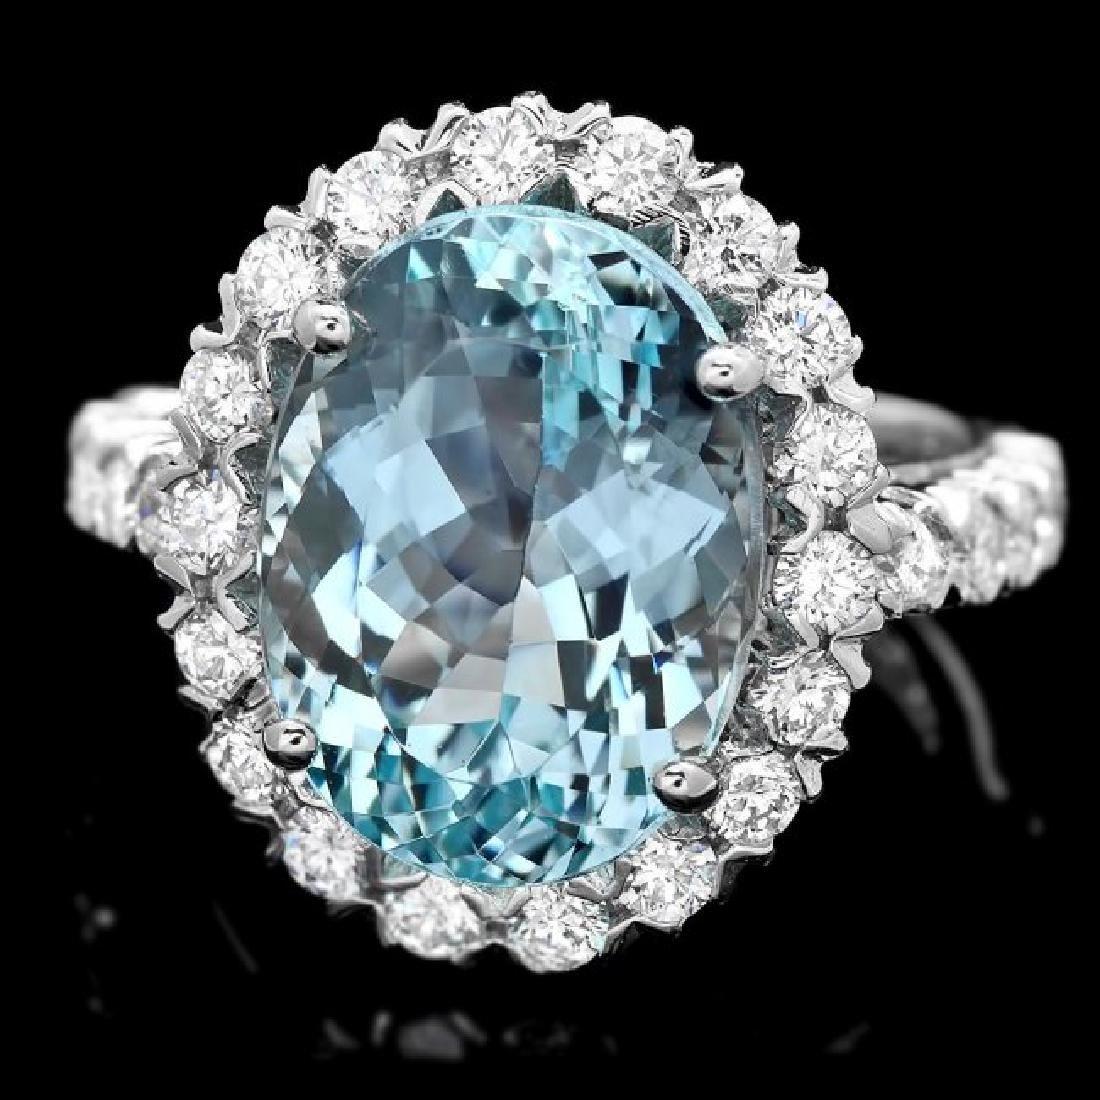 14k Gold 7.70ct Aquamarine 1.27ct Diamond Ring